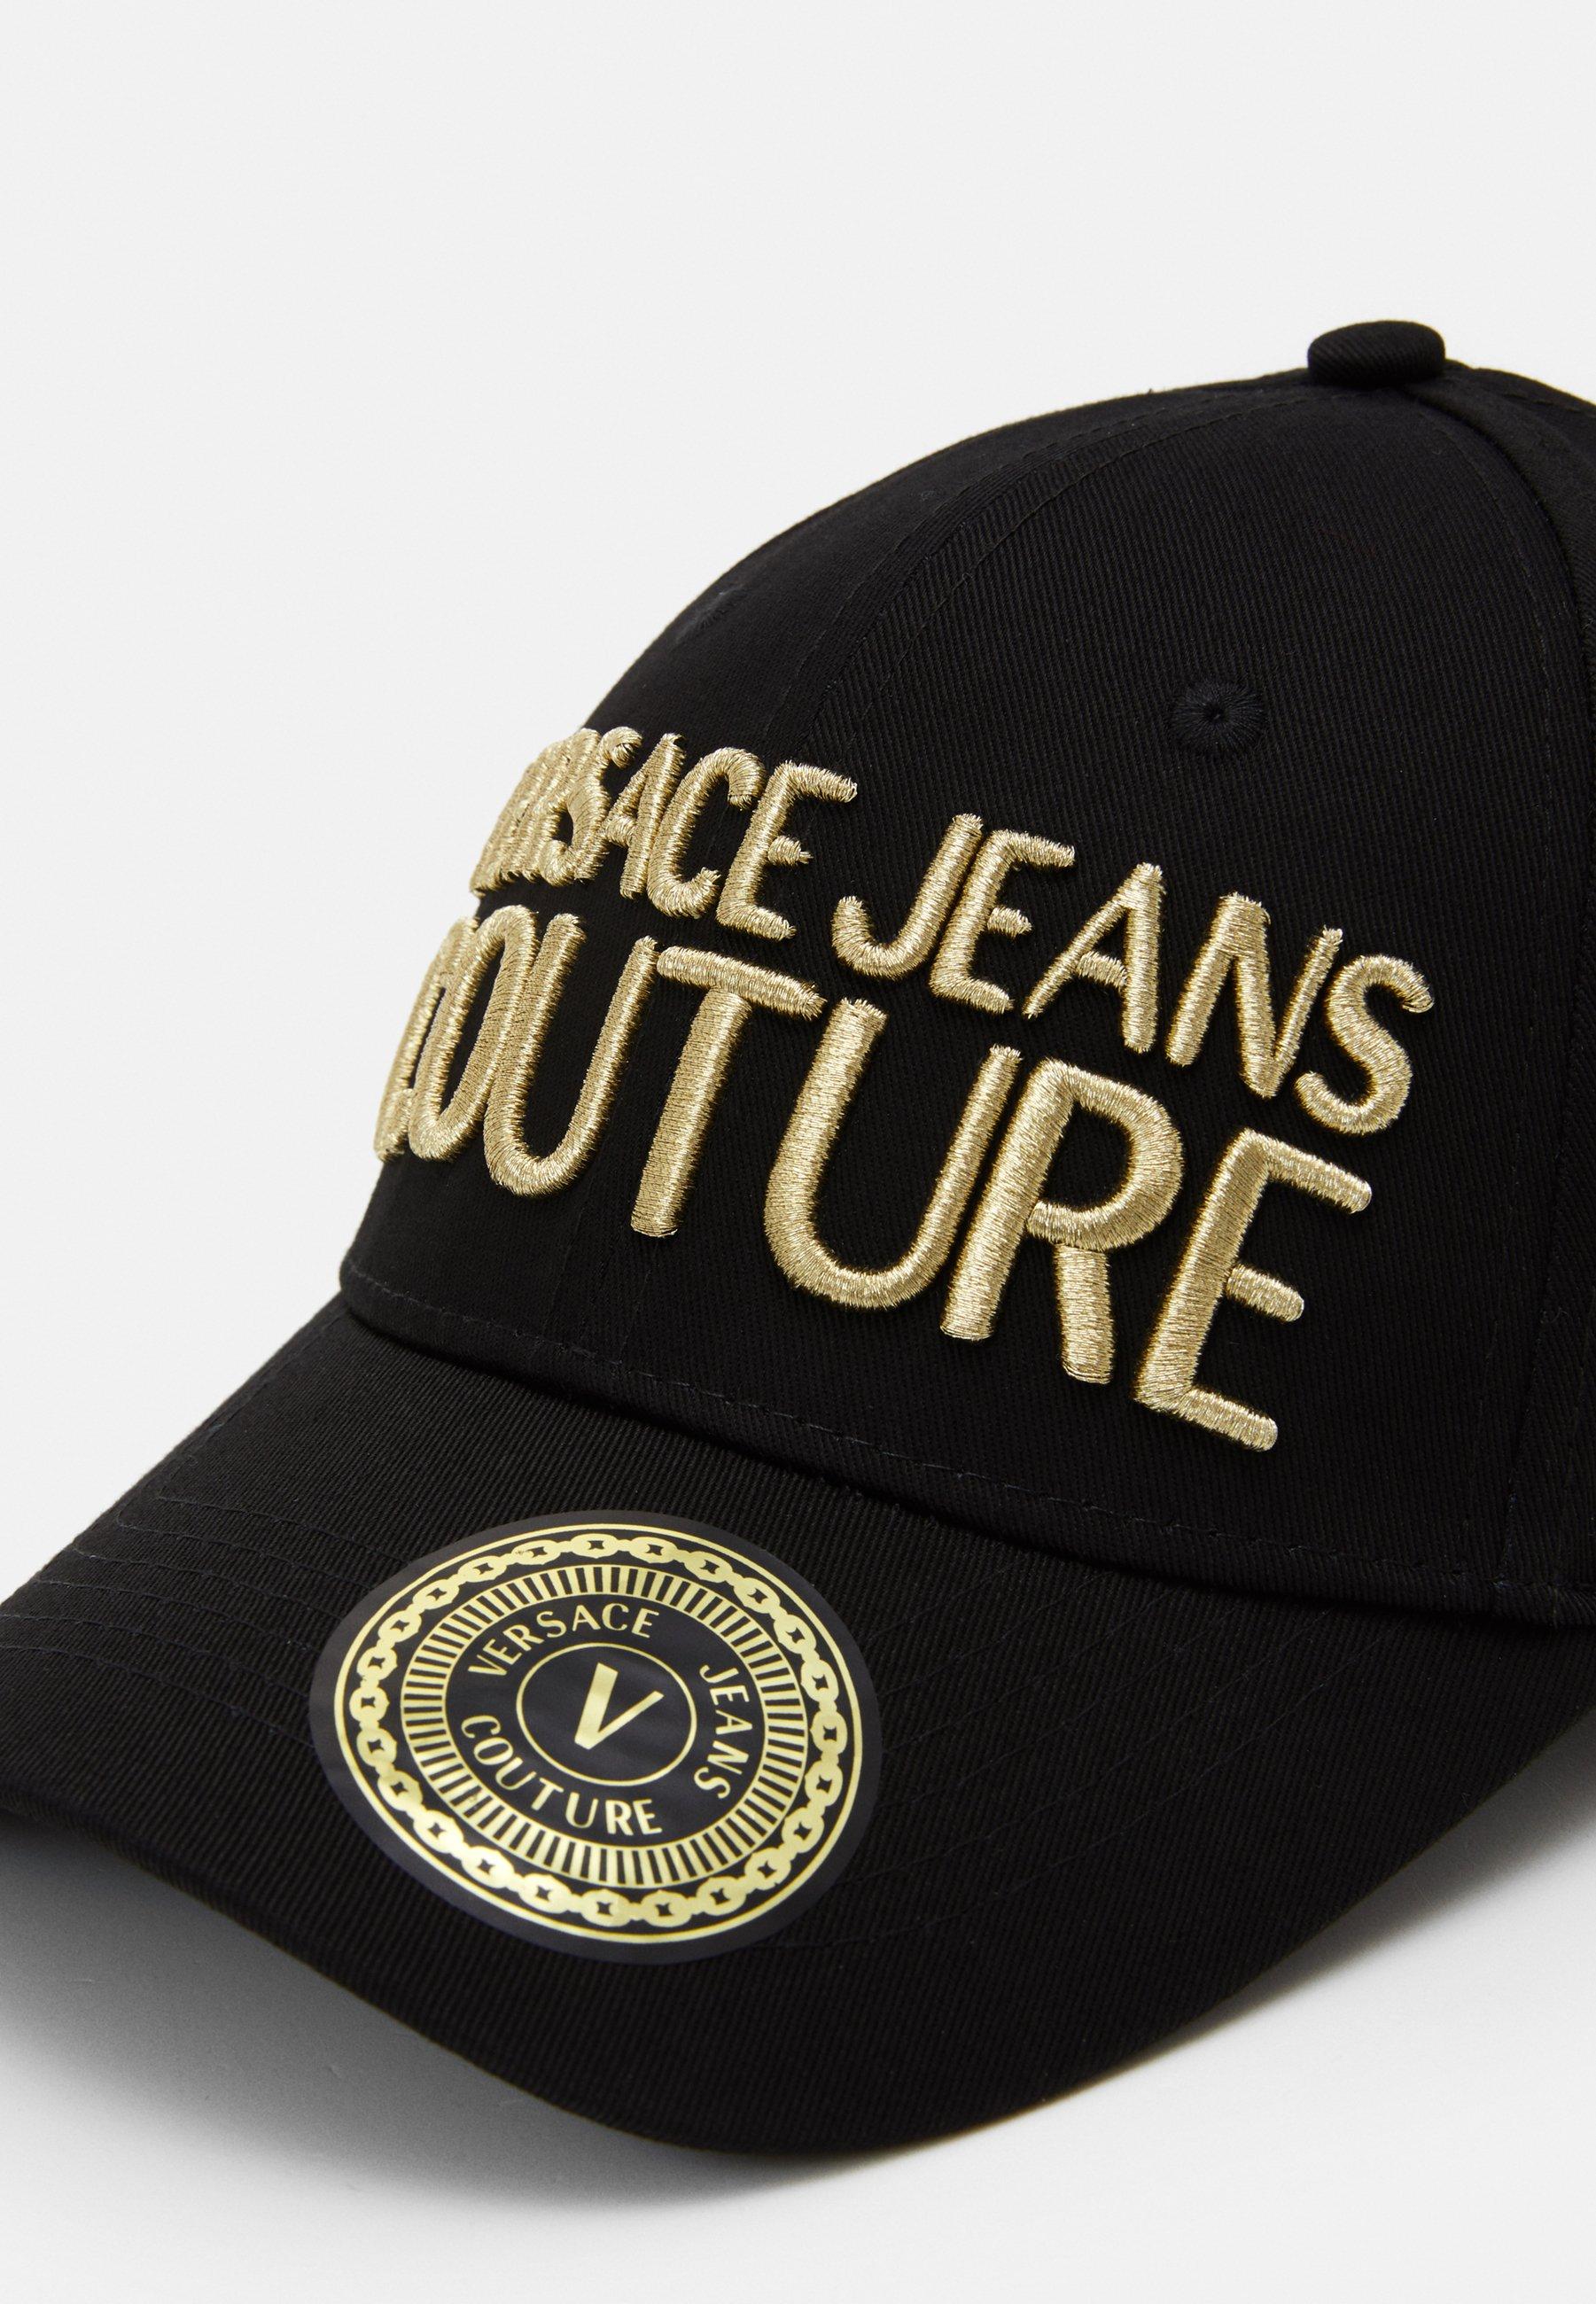 Versace Jeans Couture Cap - Nero/schwarz